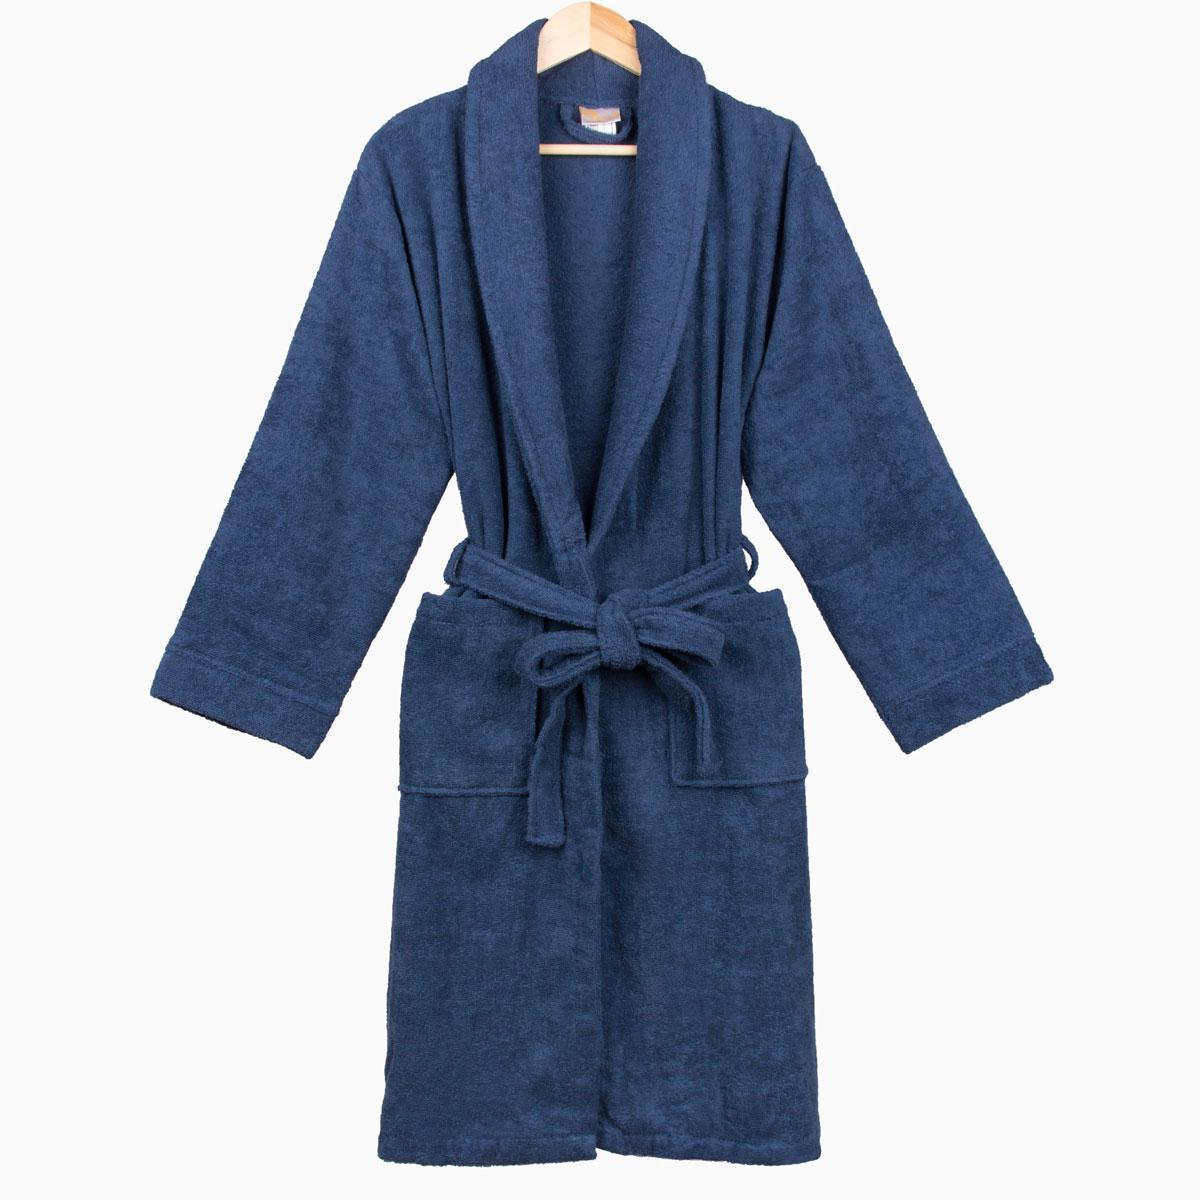 36543aac158d Халат мужской махровый Miranda Soft Синий XL Arya AR-TRK111000017468-bl-xl